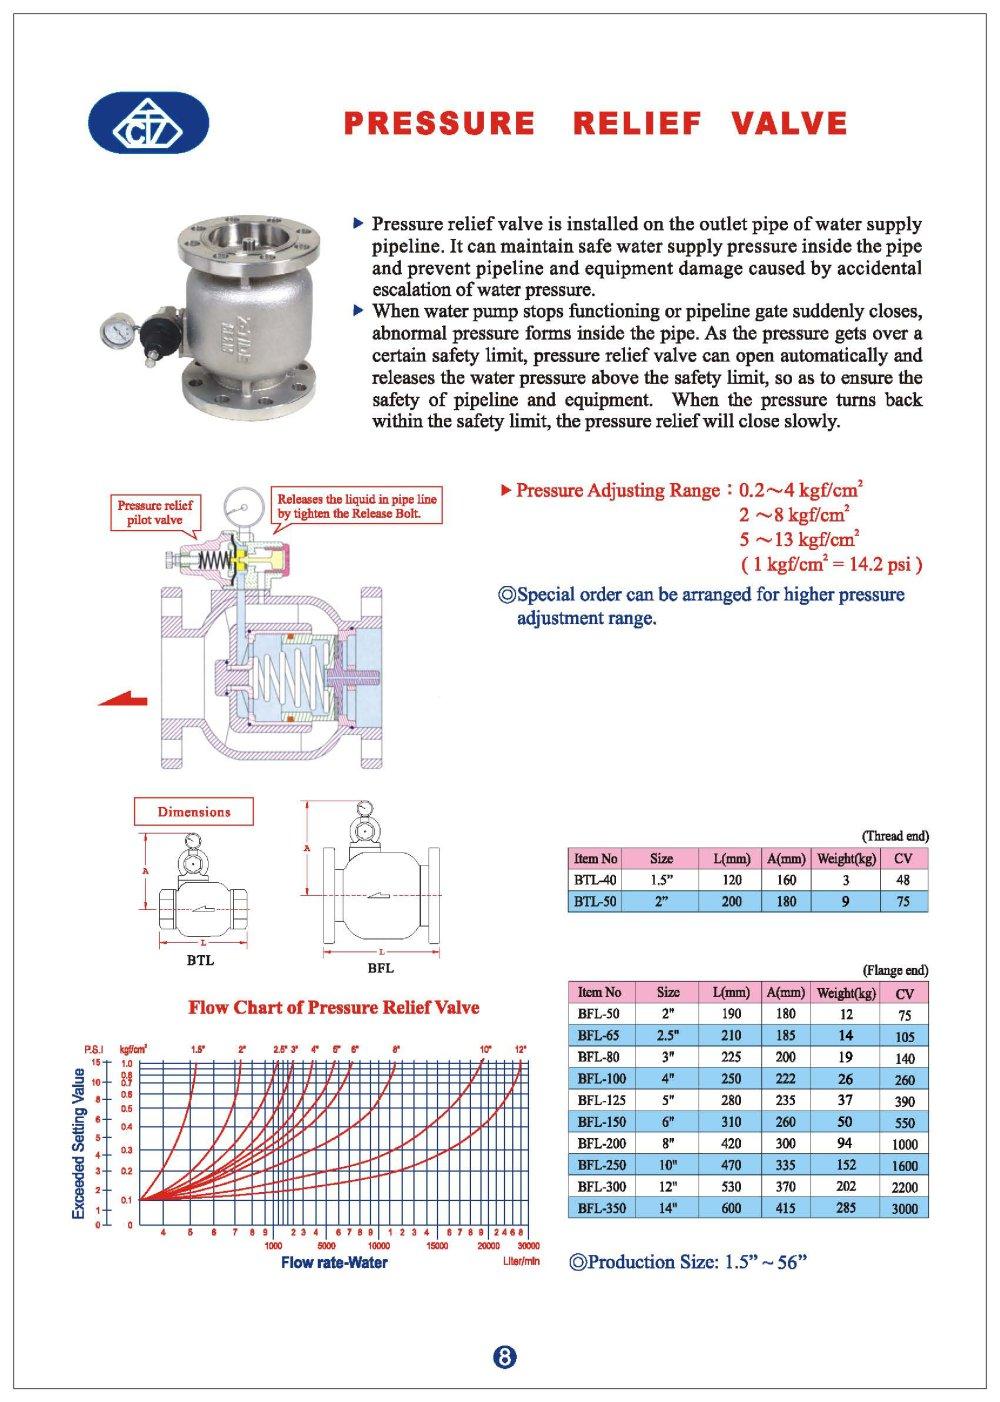 Pressure relief valve elite line industrial corp pdf pressure relief valve 1 1 pages nvjuhfo Choice Image